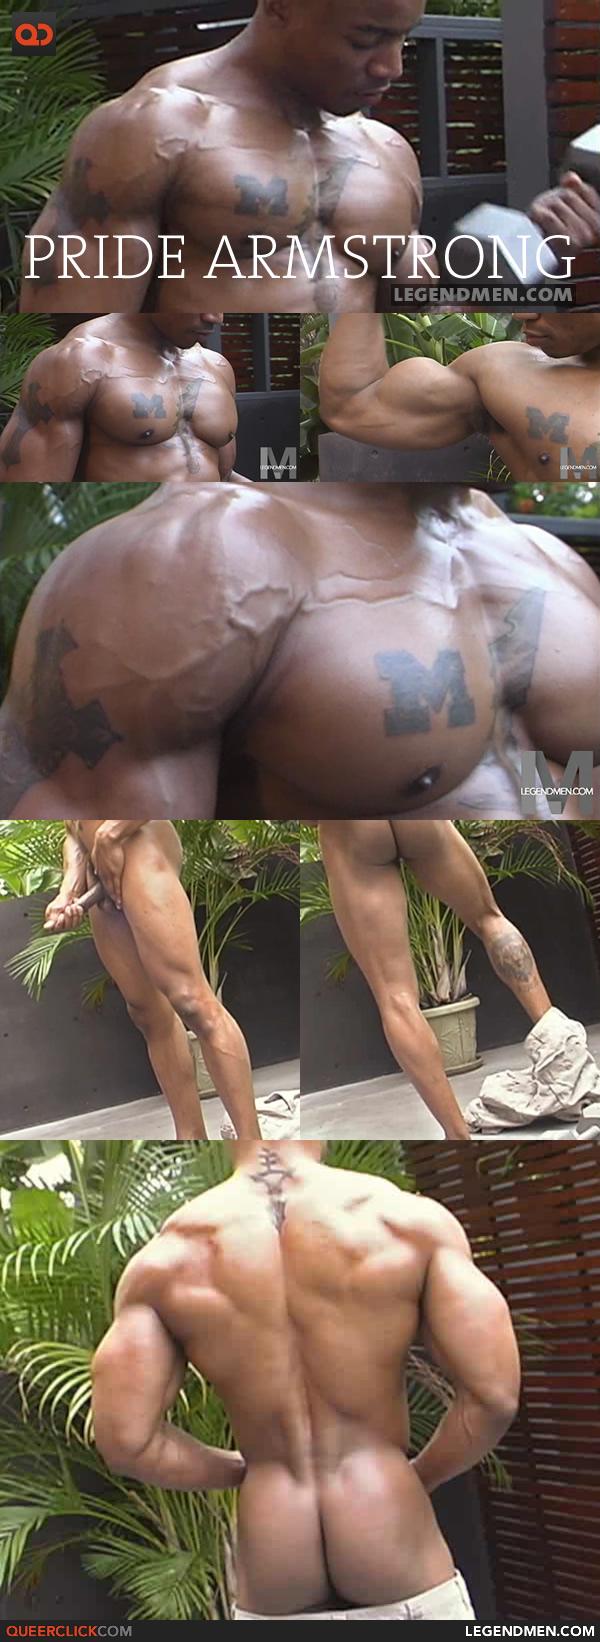 Legend Men: Pride Armstrong